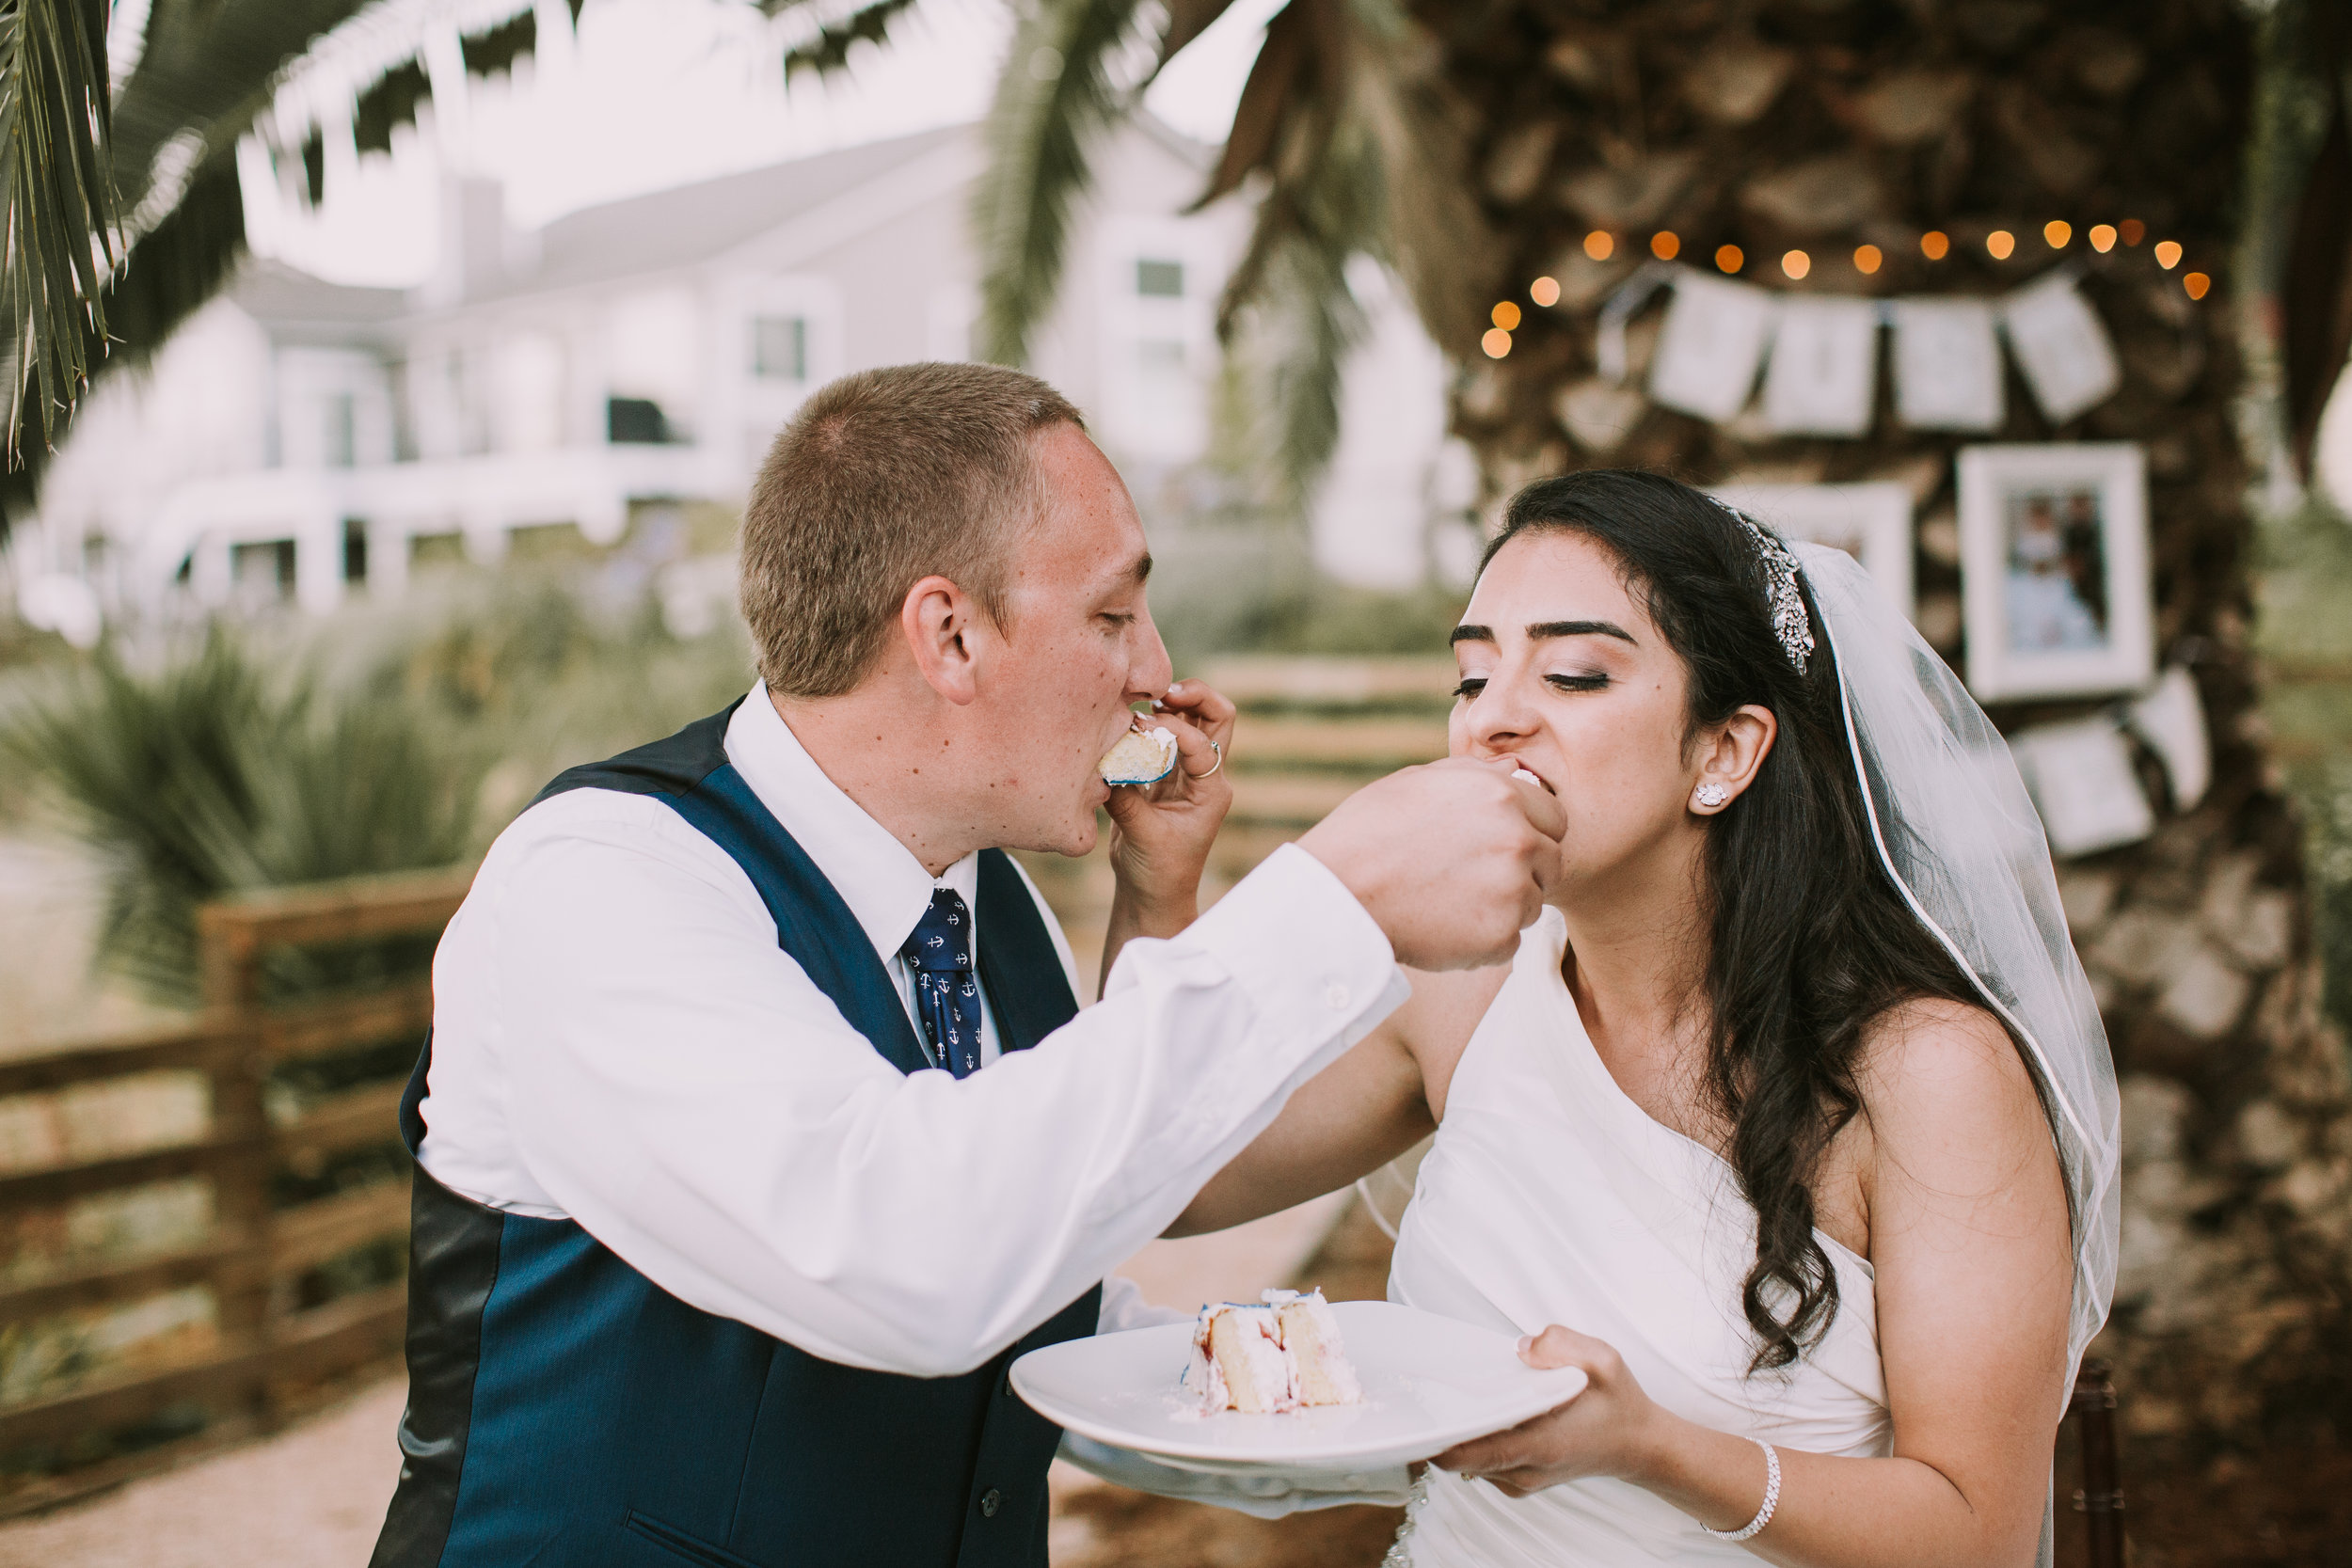 RYDER WEDDING-RYDER WEDDING 2-0153.jpg